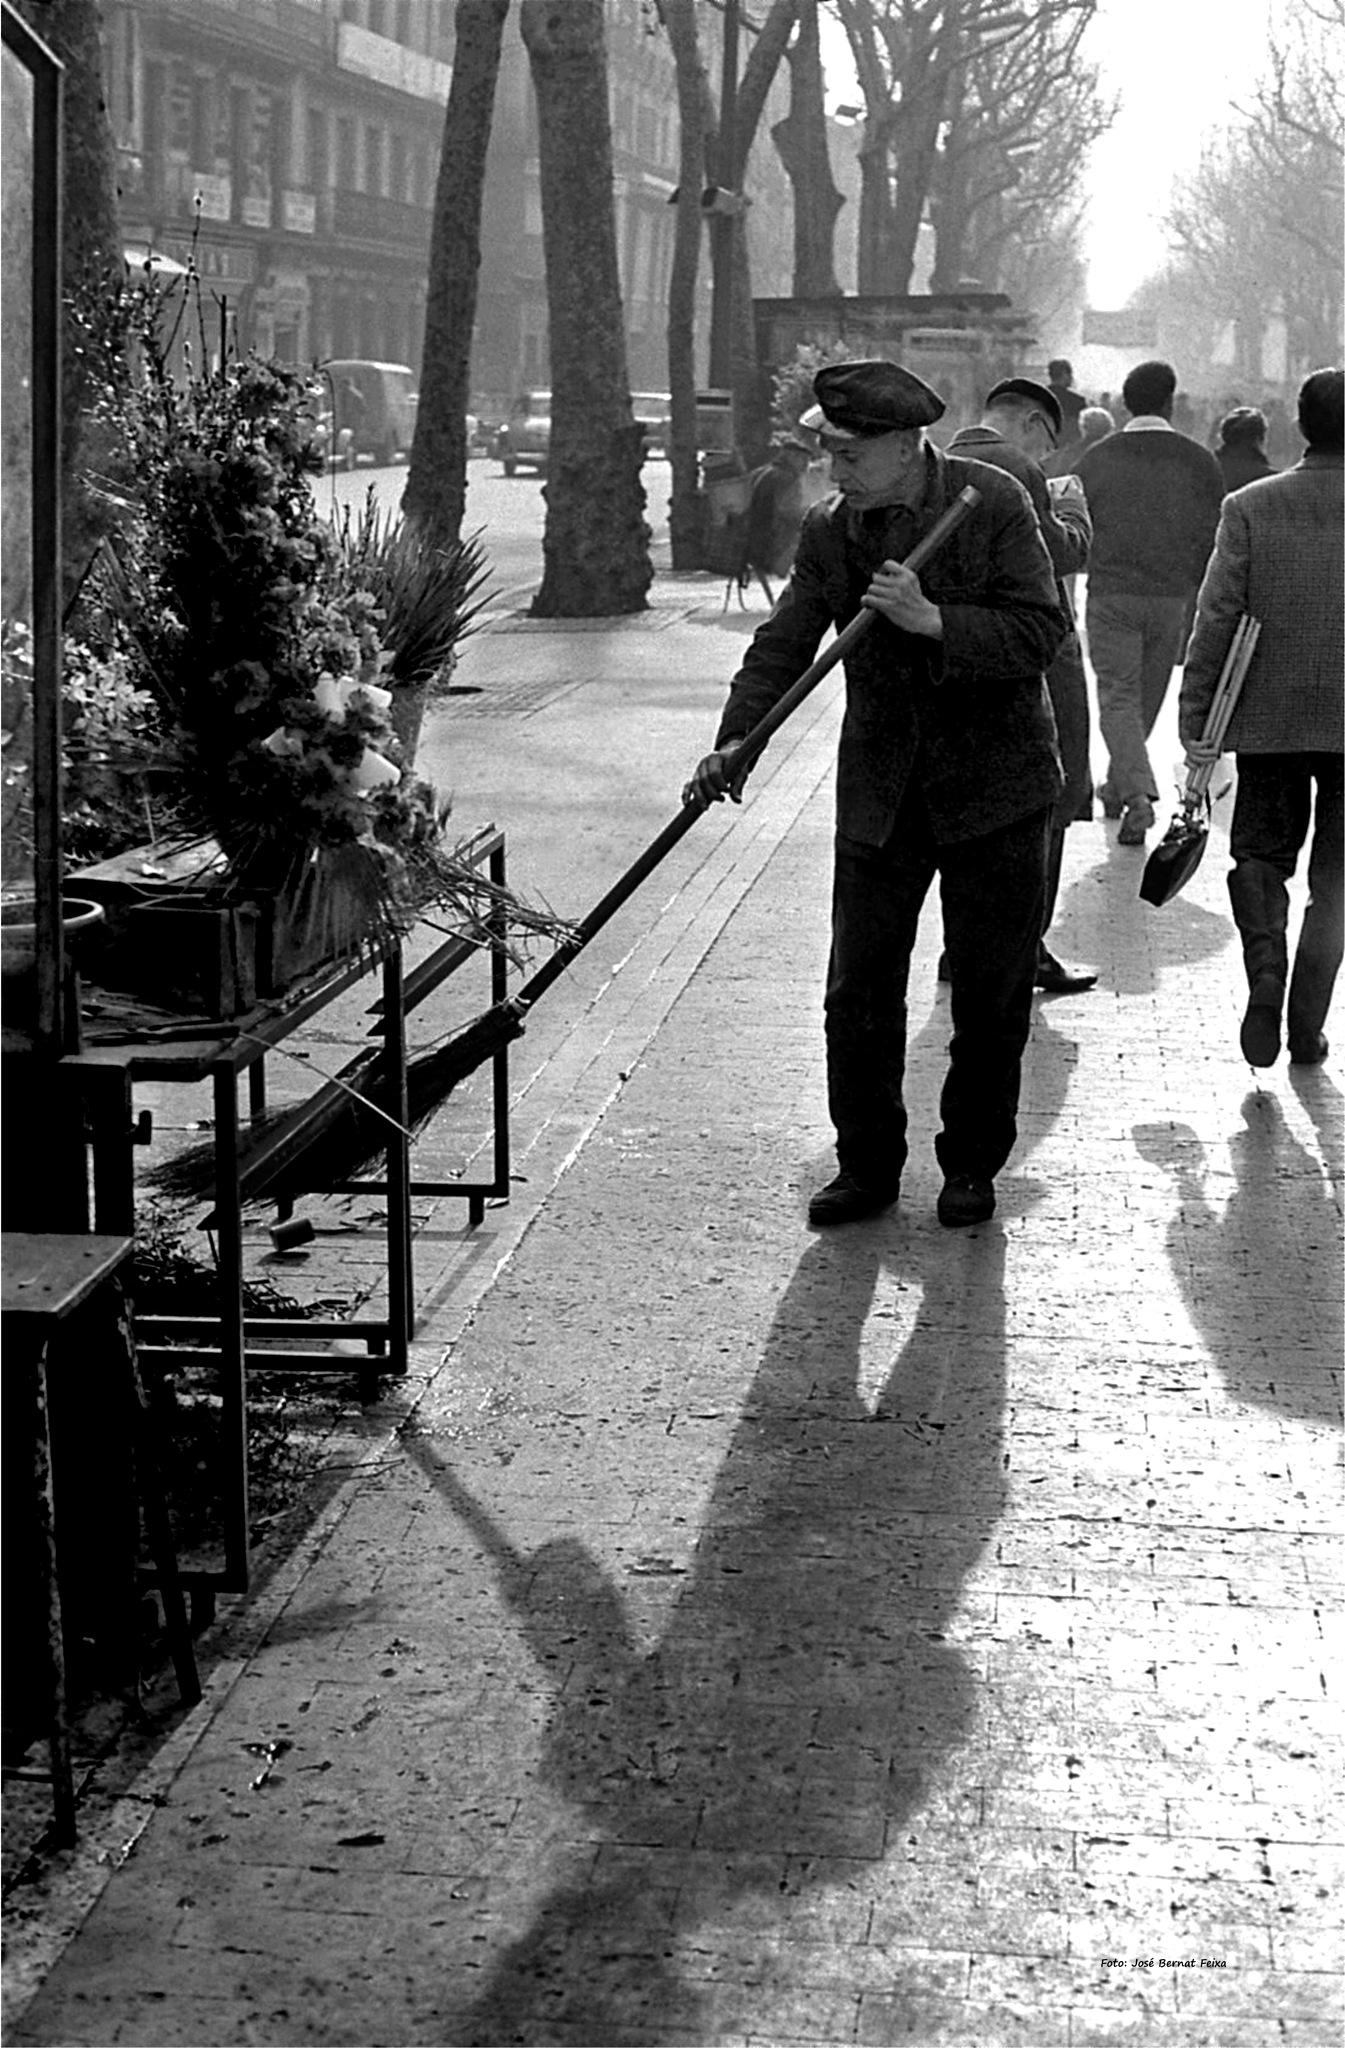 BARRENDERO ; STRAATVEGER ; STREET SWEEPER (60's) by José Bernat Feixa